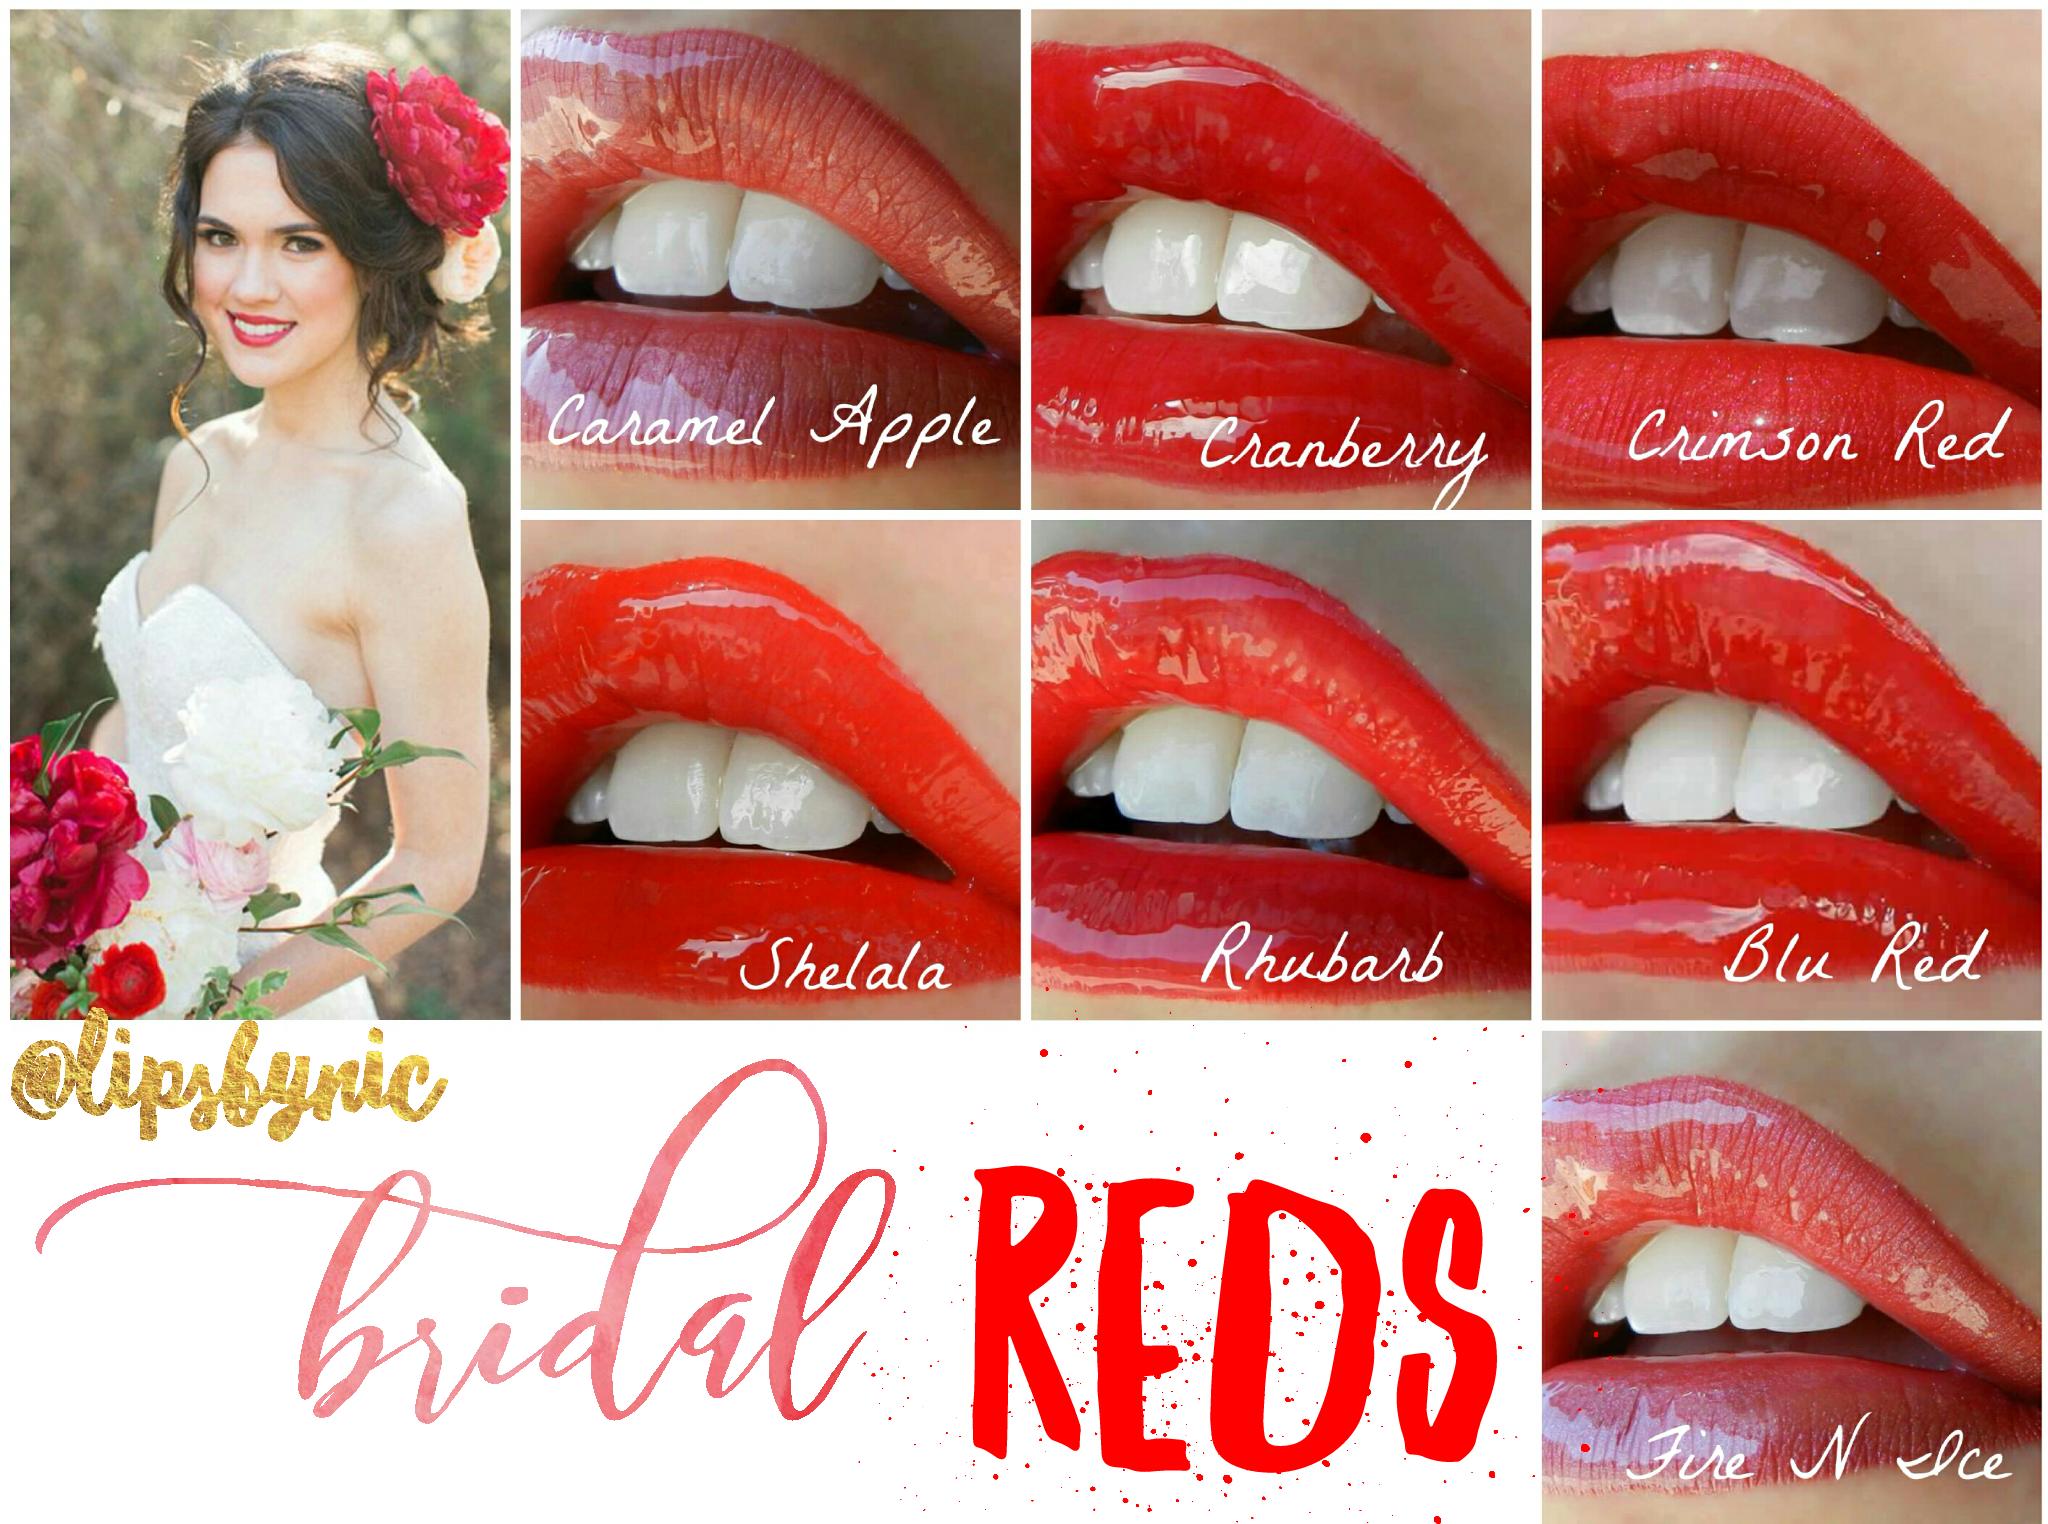 lipsense-reds-long-lasting-wedding-lipstick